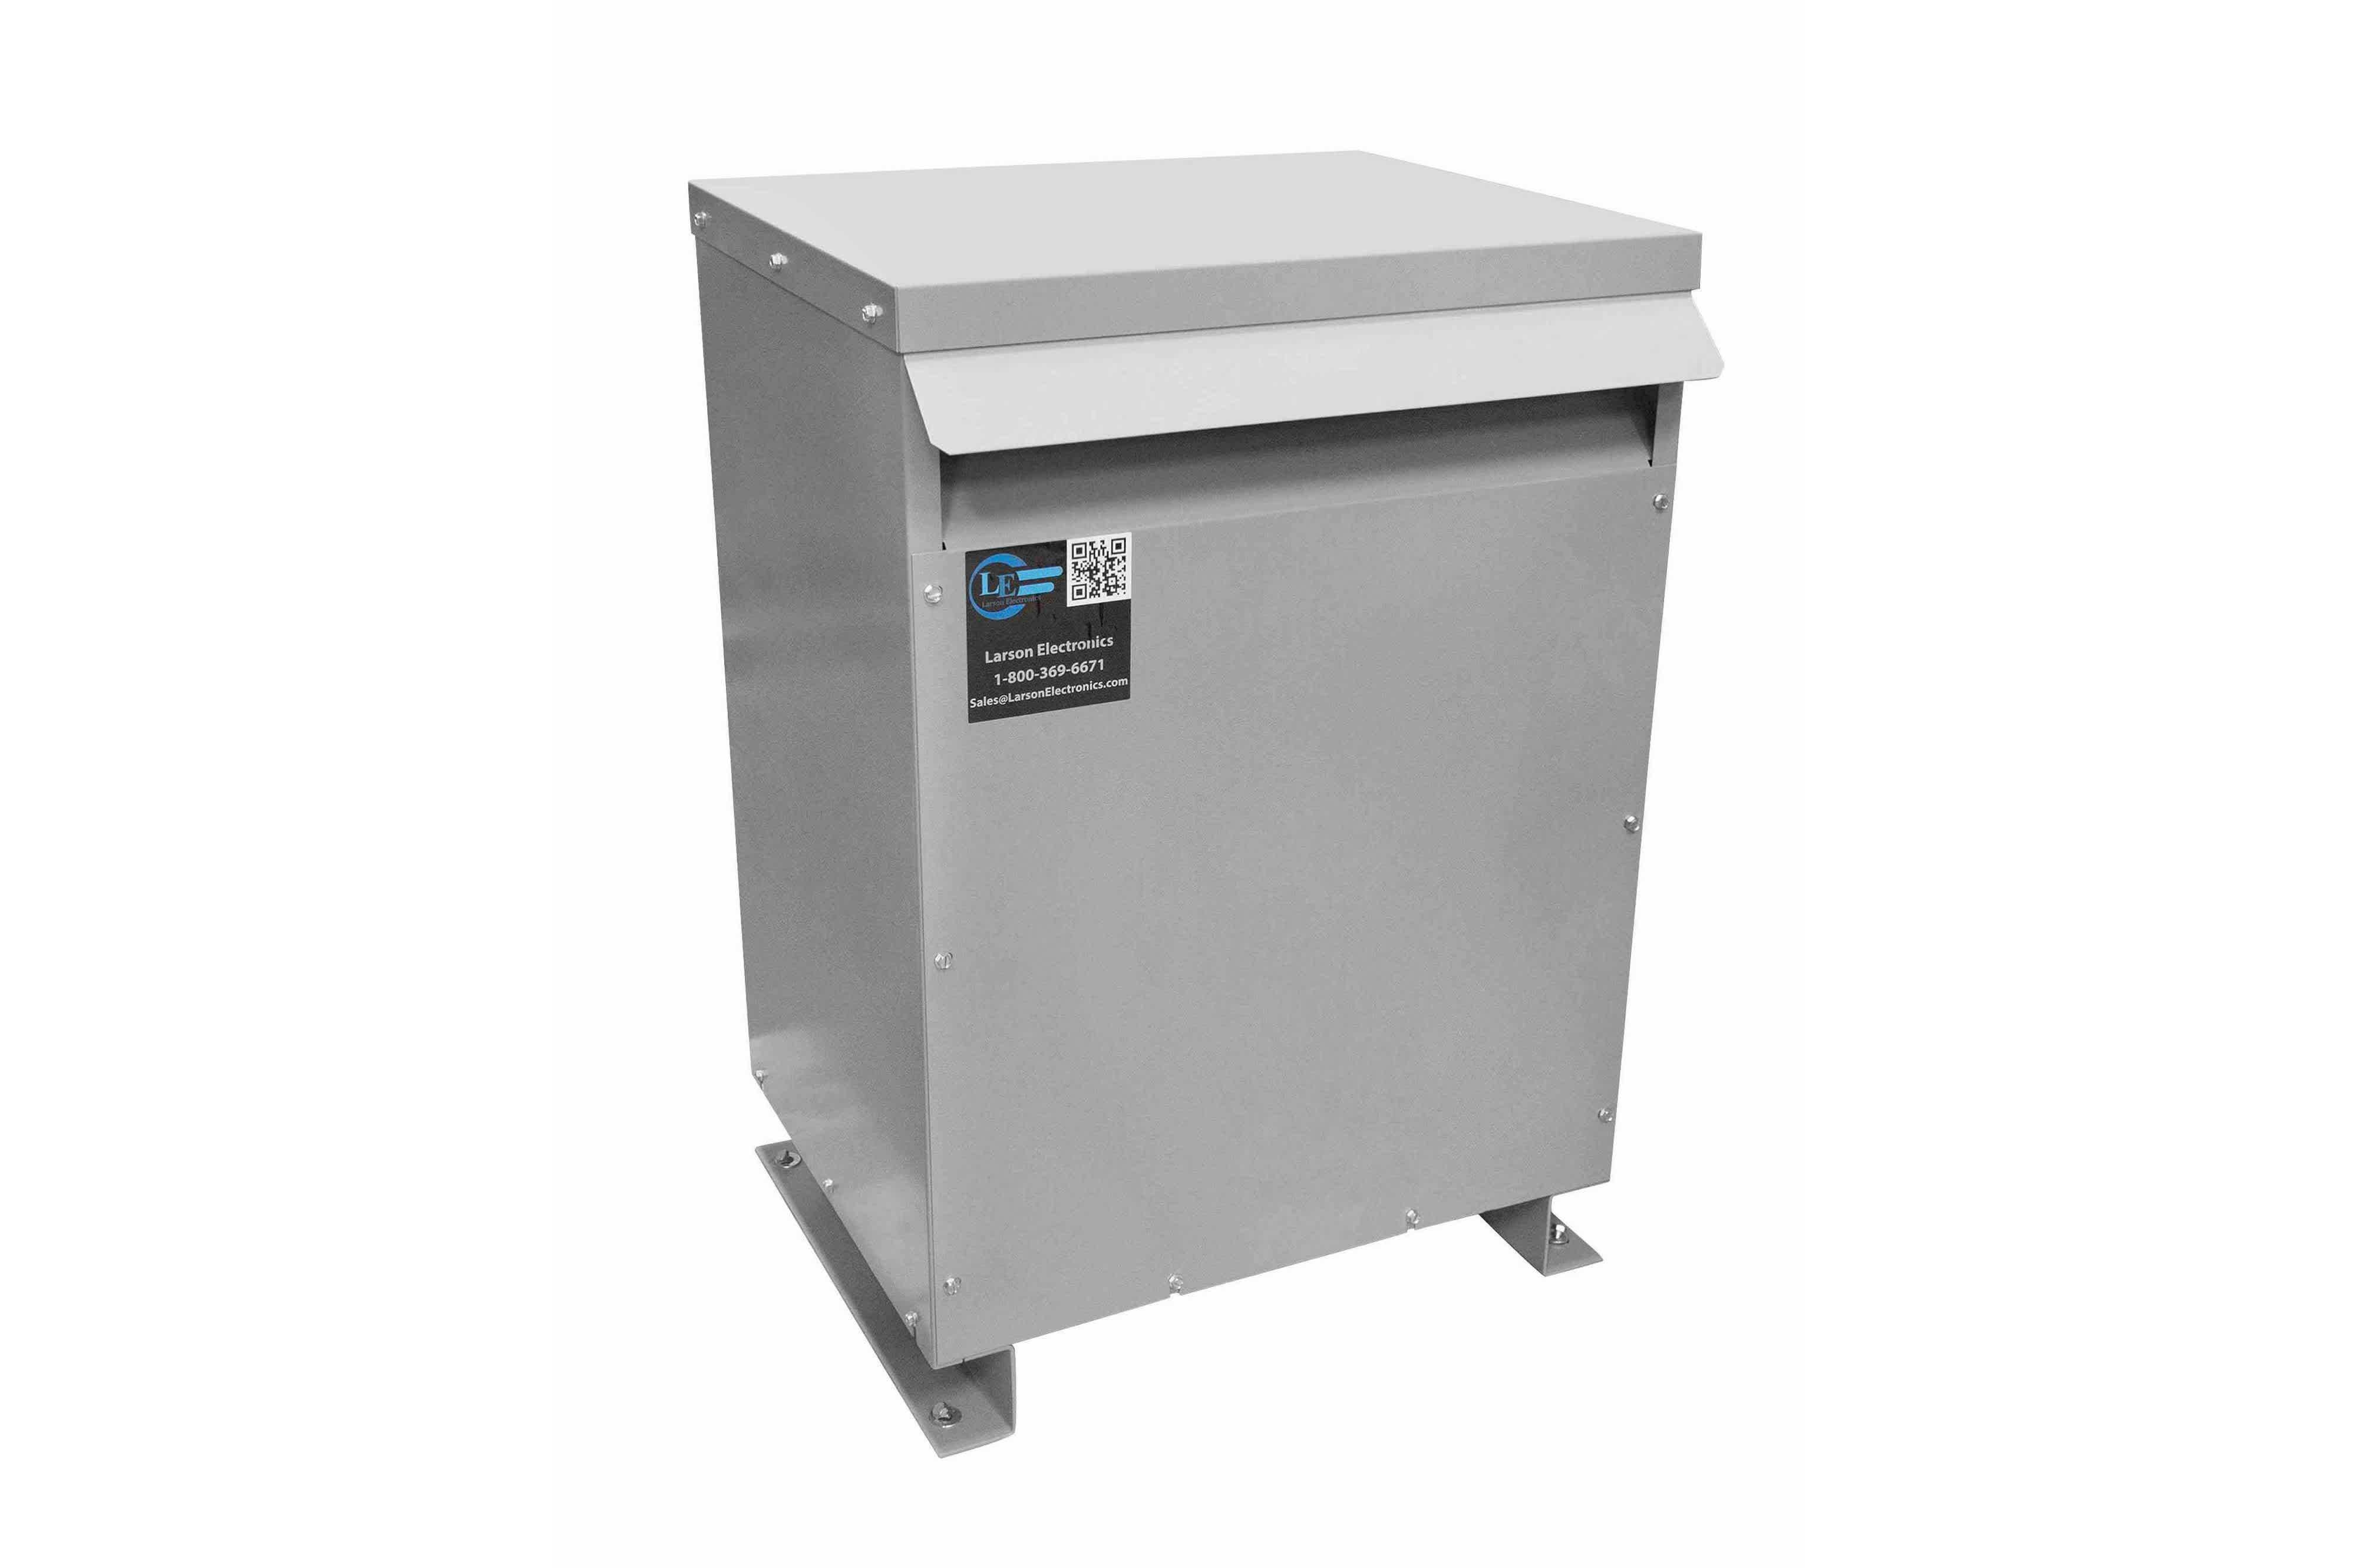 1000 kVA 3PH Isolation Transformer, 400V Wye Primary, 208Y/120 Wye-N Secondary, N3R, Ventilated, 60 Hz